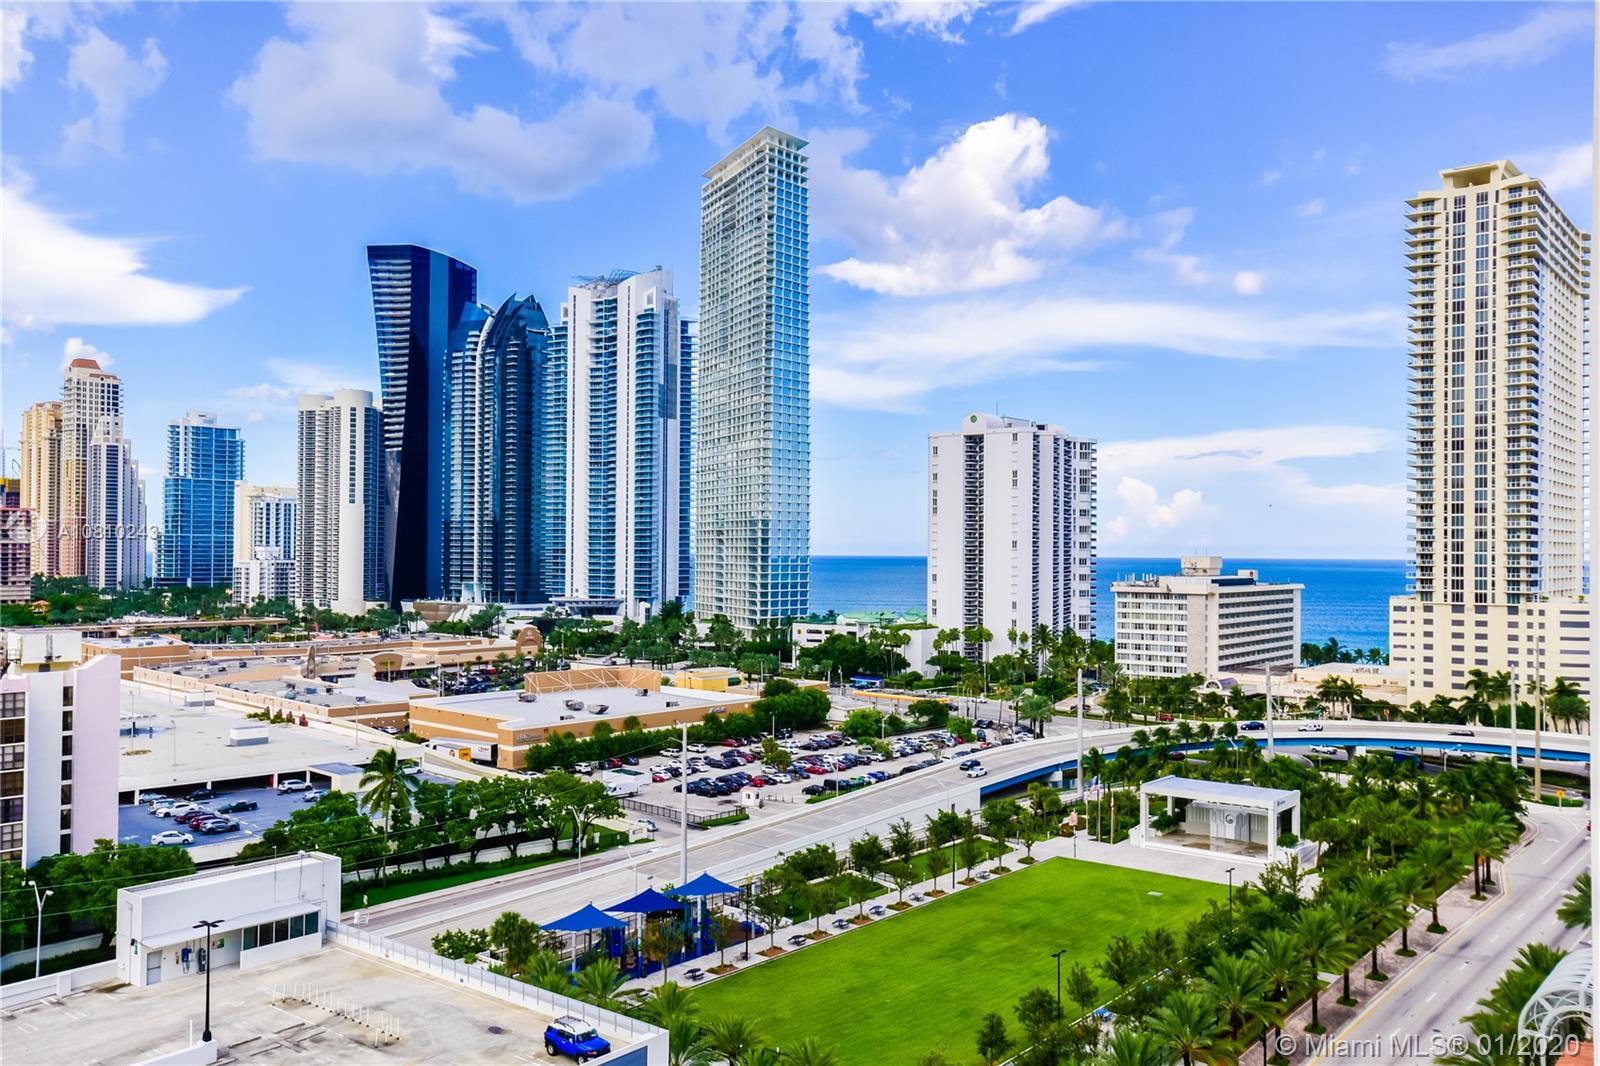 Parque Tower 1 #4-1401 - 300 Sunny Isles Blvd #4-1401, Sunny Isles Beach, FL 33160